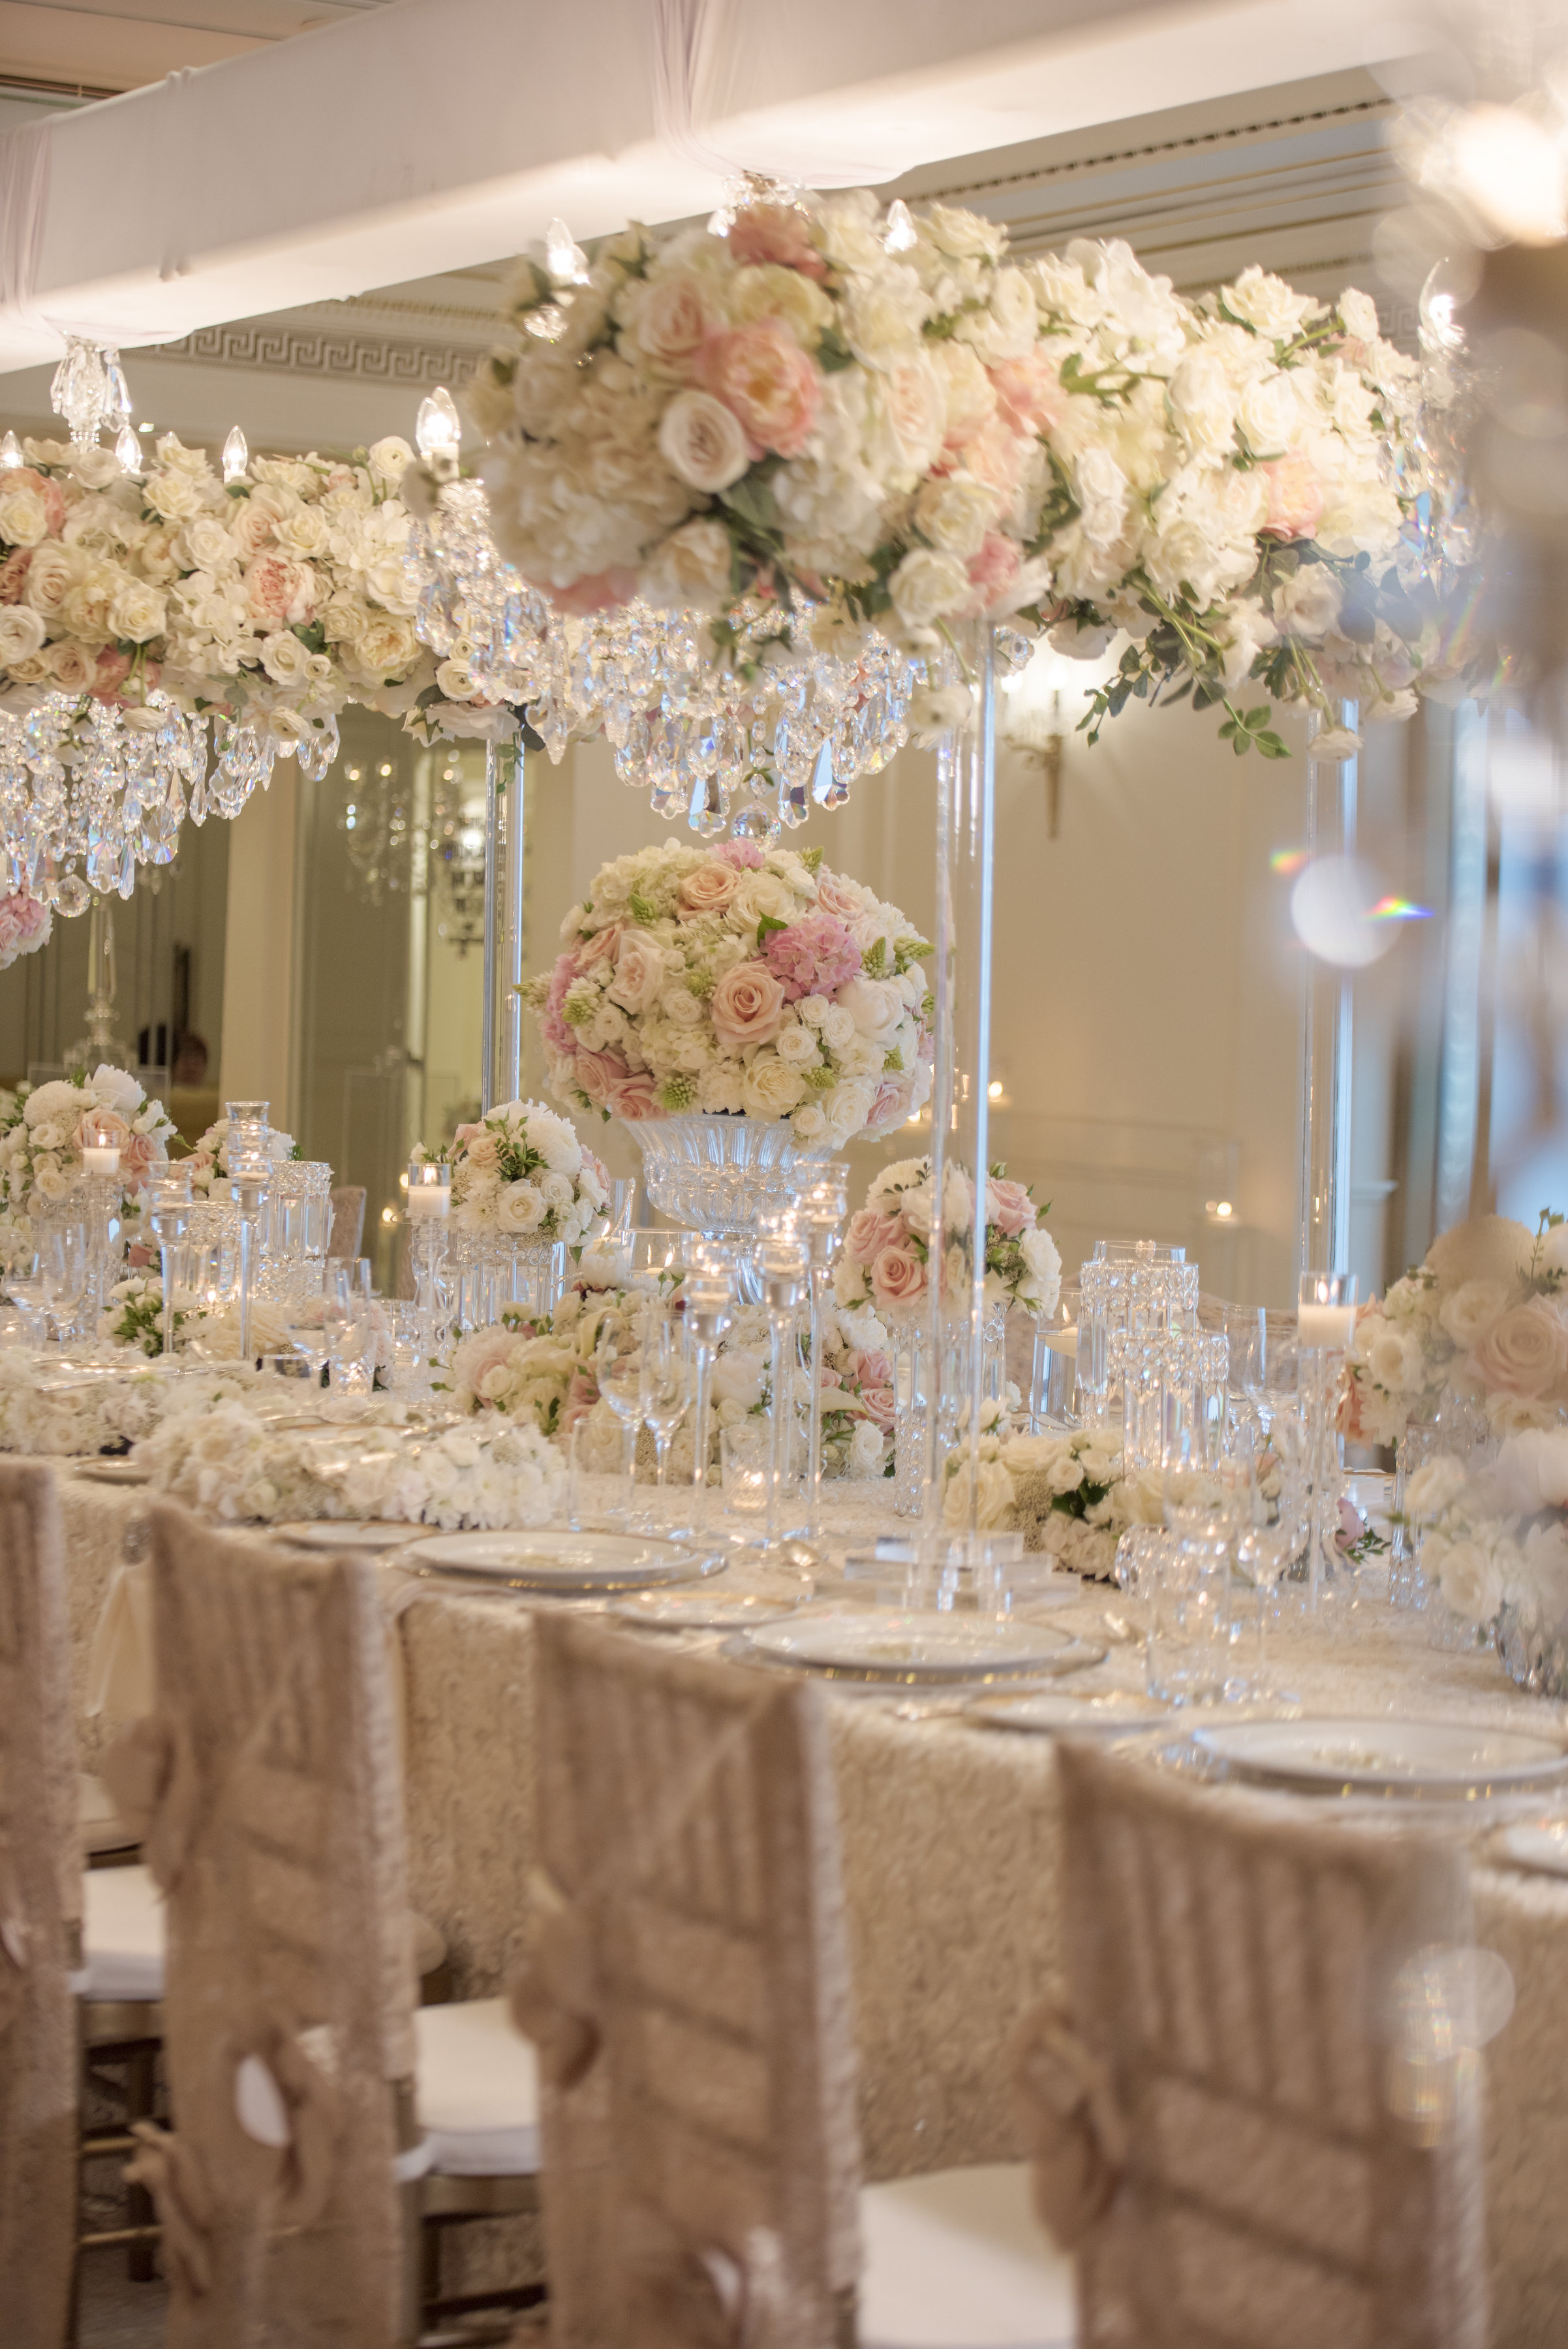 Hire_Ivory_rose_luxury_linen_sydney_wedding_decor_event_Versace_Decor_king_table_setting_chandeliers_crystal.jpg